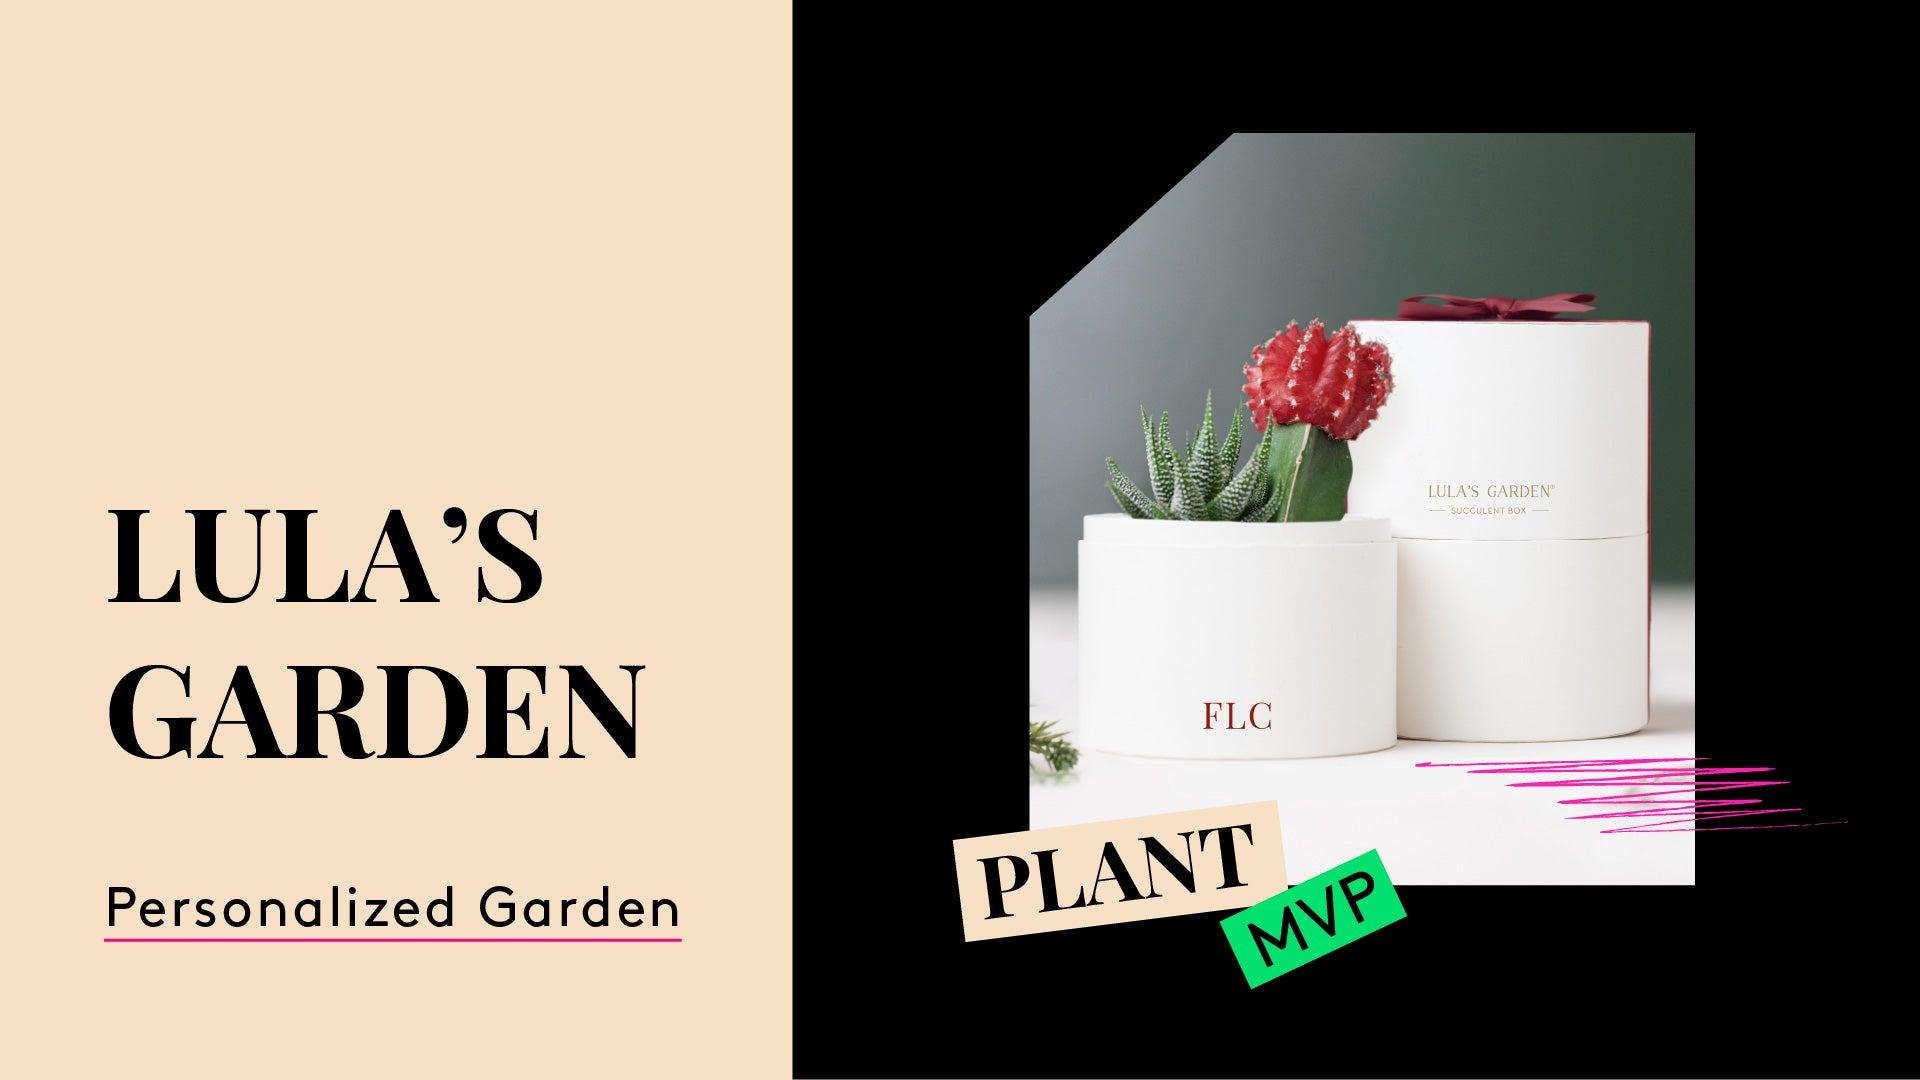 Plant MPV. A photo of a succulent. Lula's Garden.